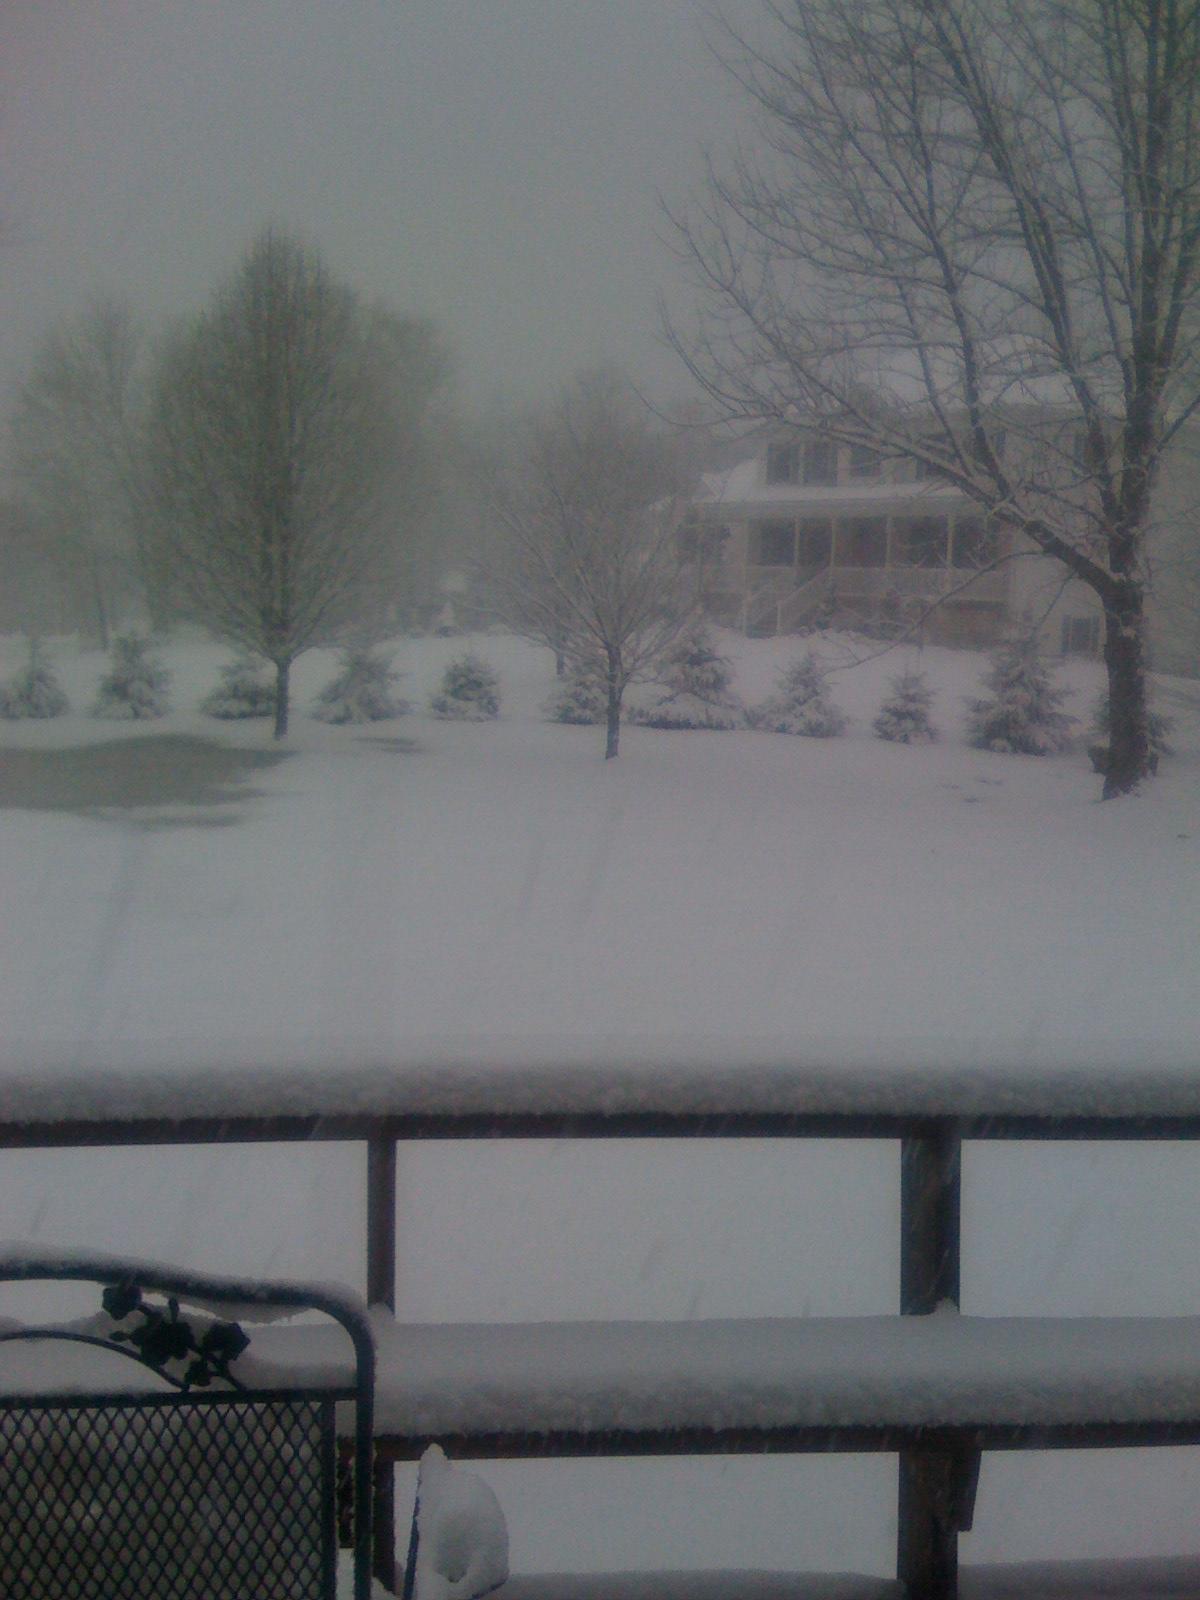 Snow Storm March 9, 2009